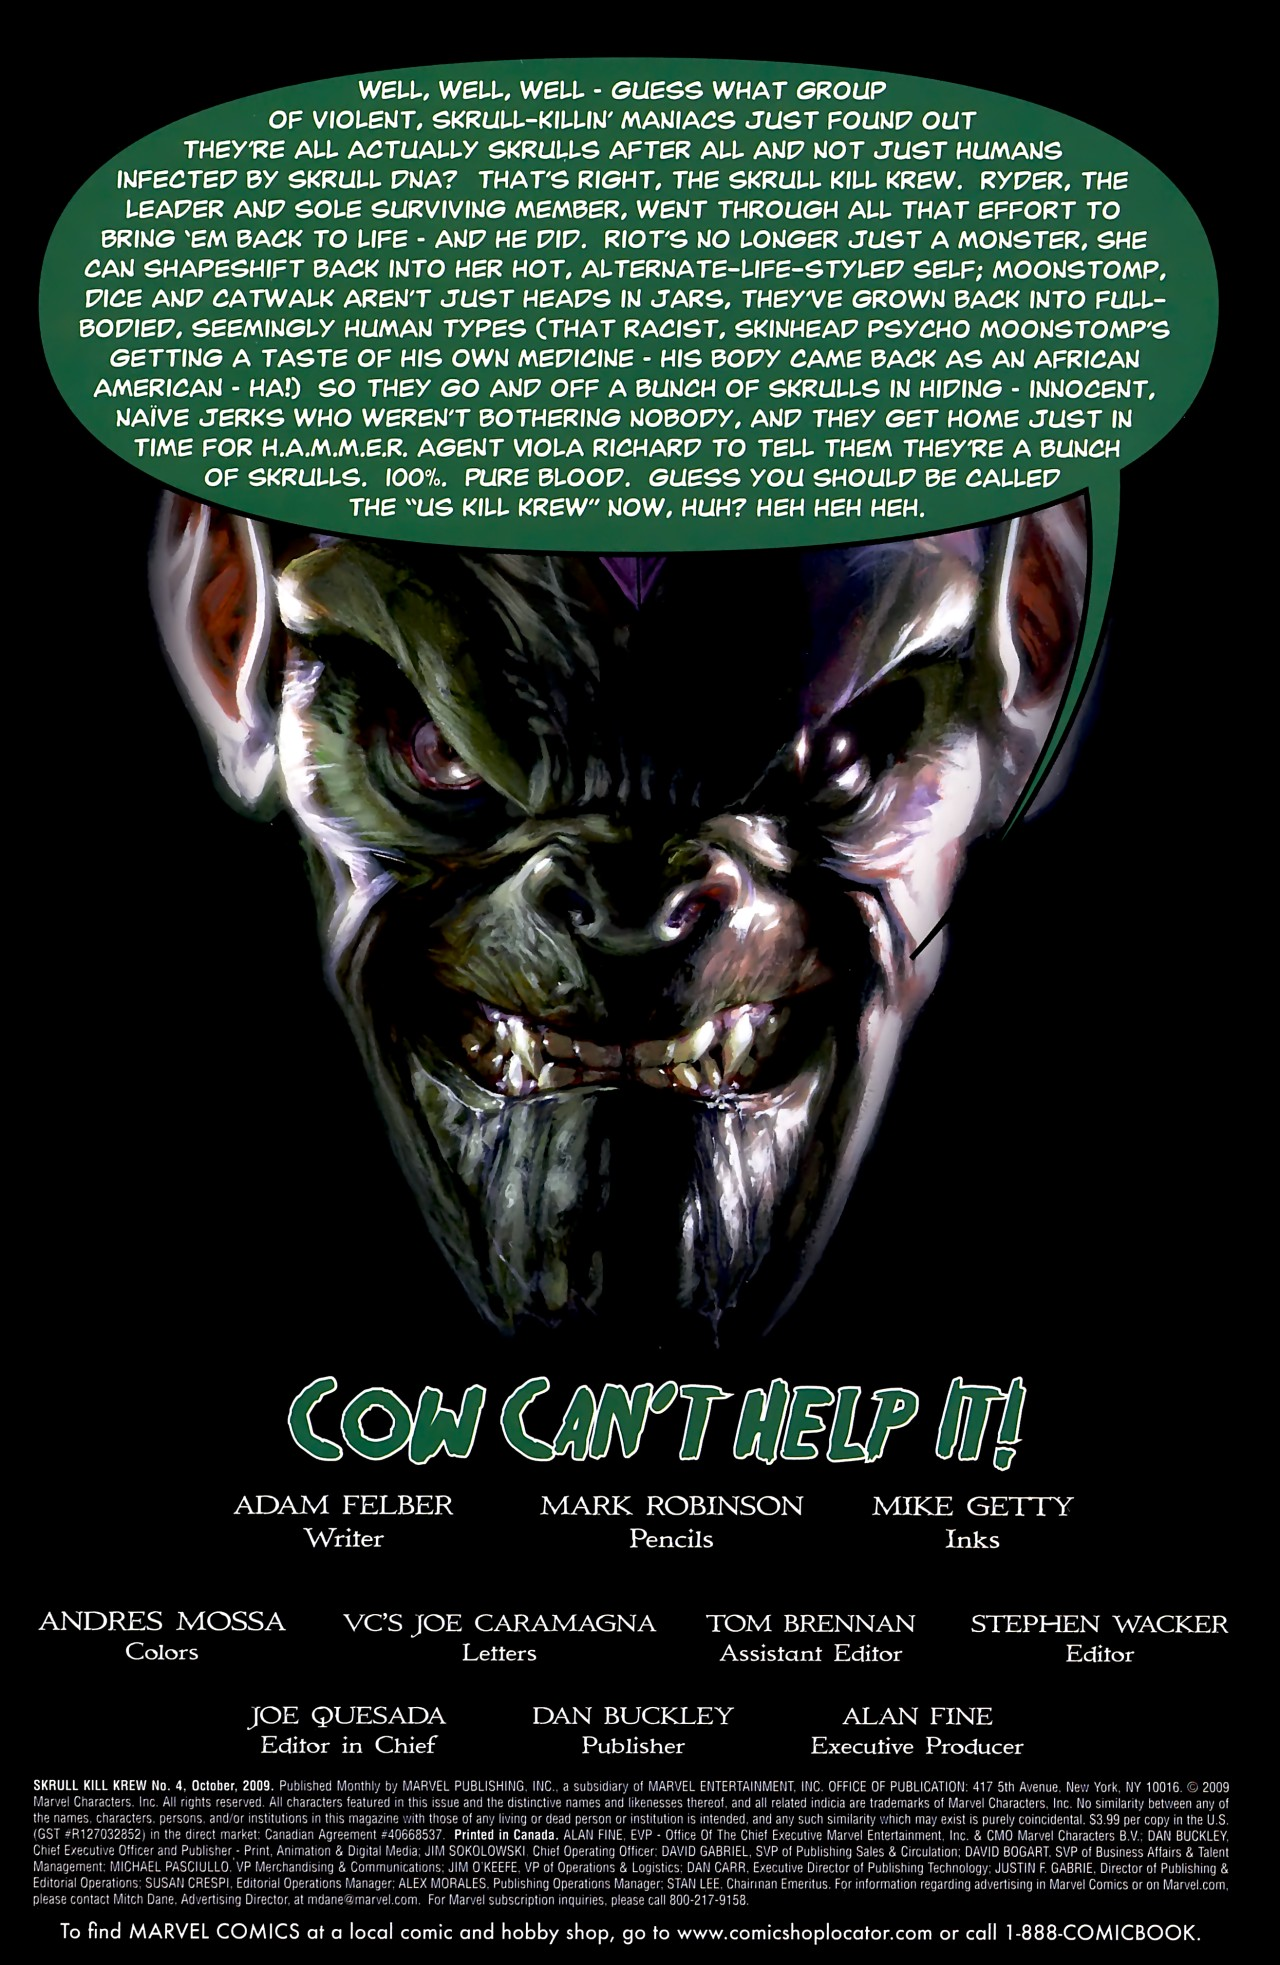 Read online Skrull Kill Krew (2009) comic -  Issue #4 - 3